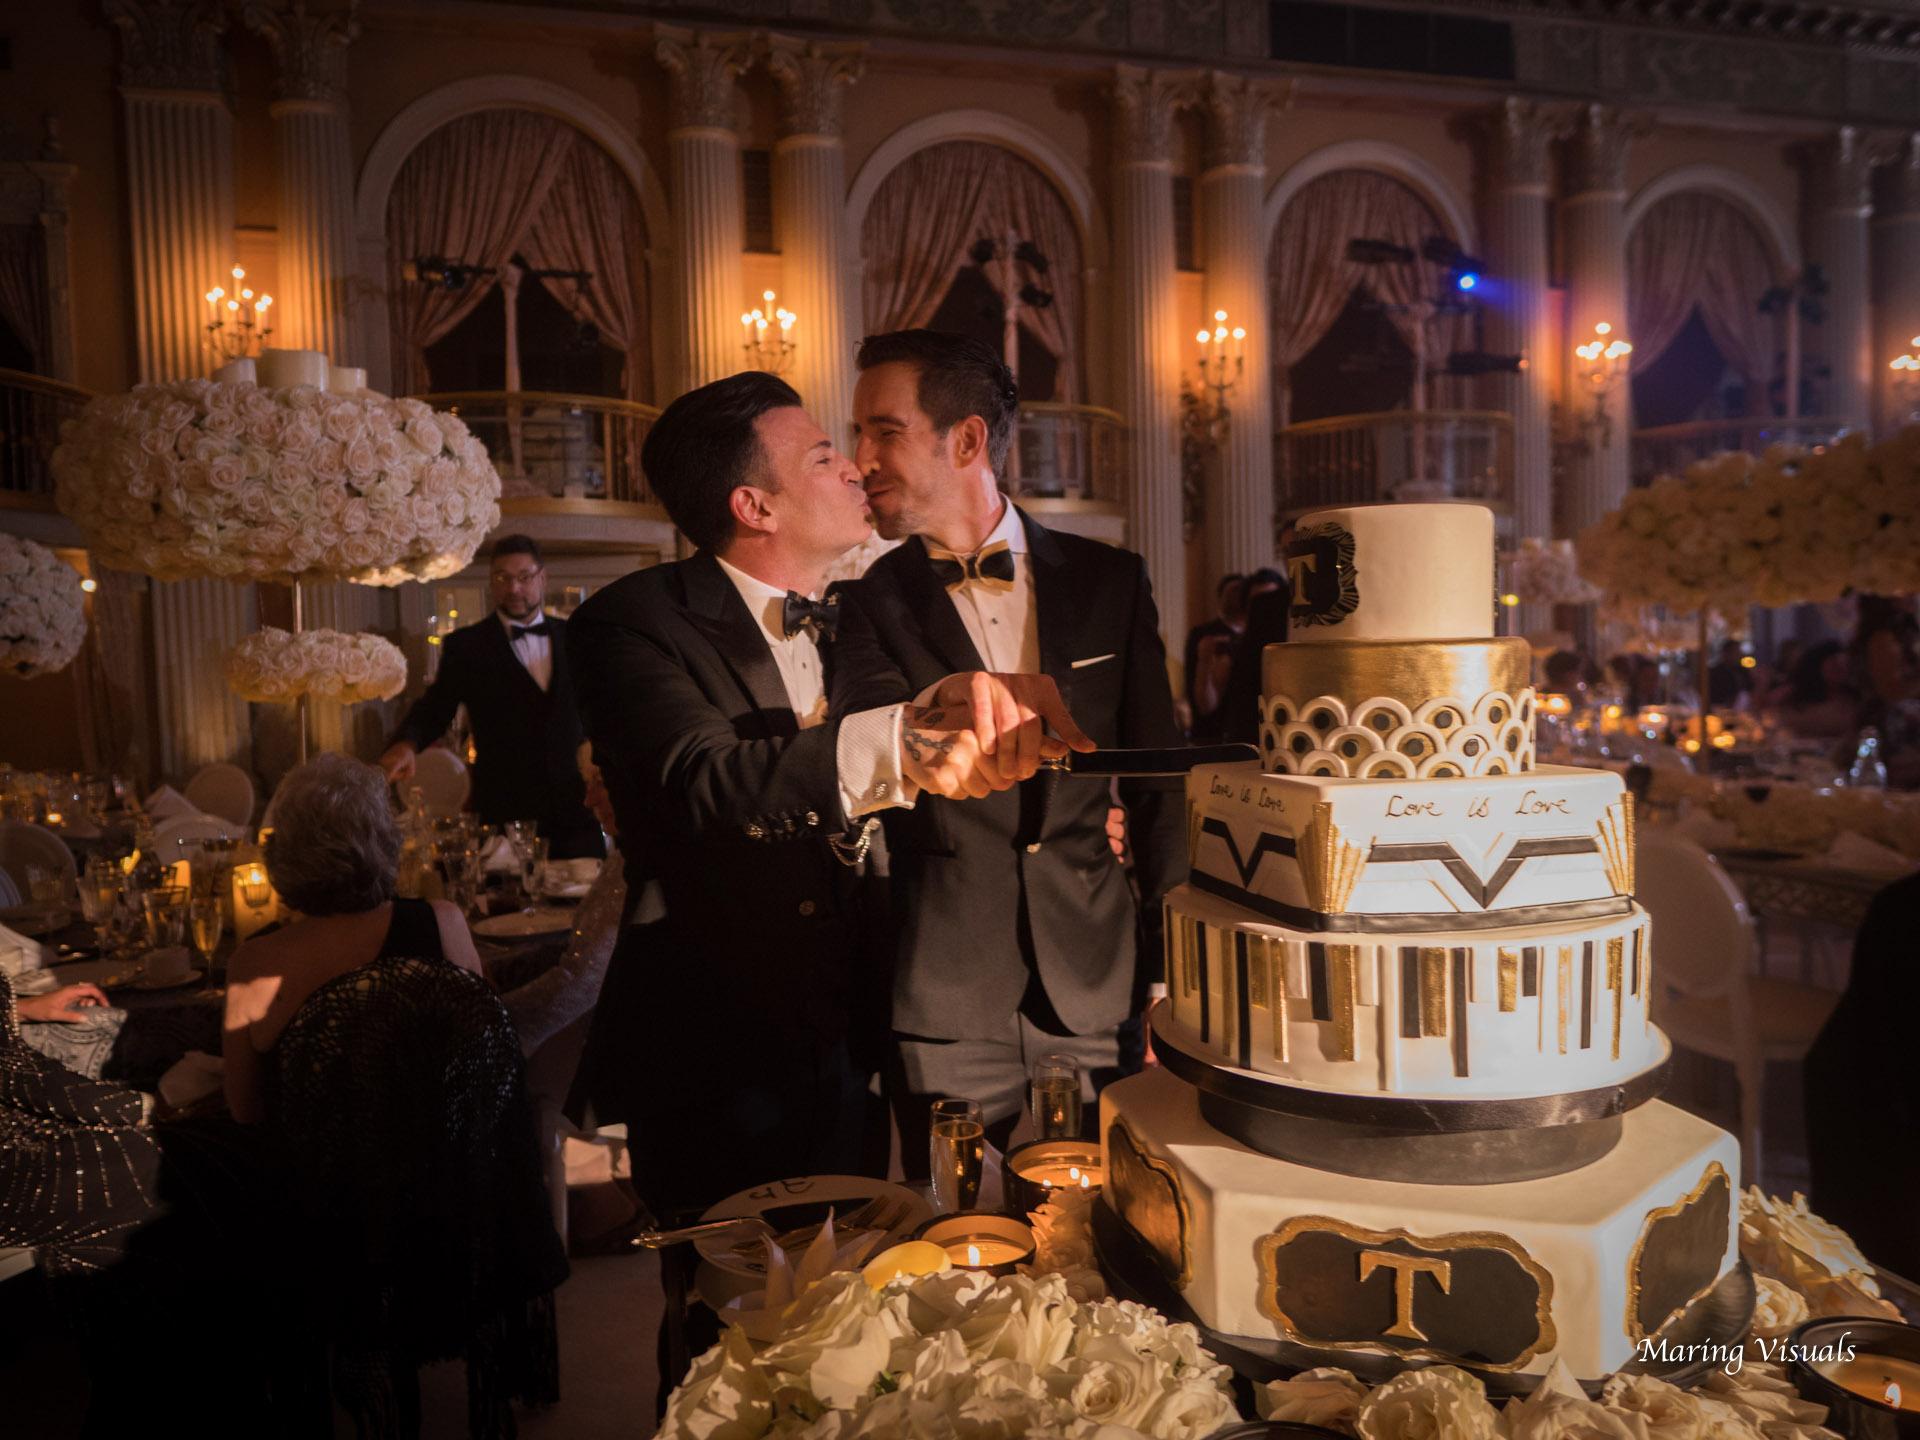 David Tutera Weddings by Maring Visuals 00577.jpg